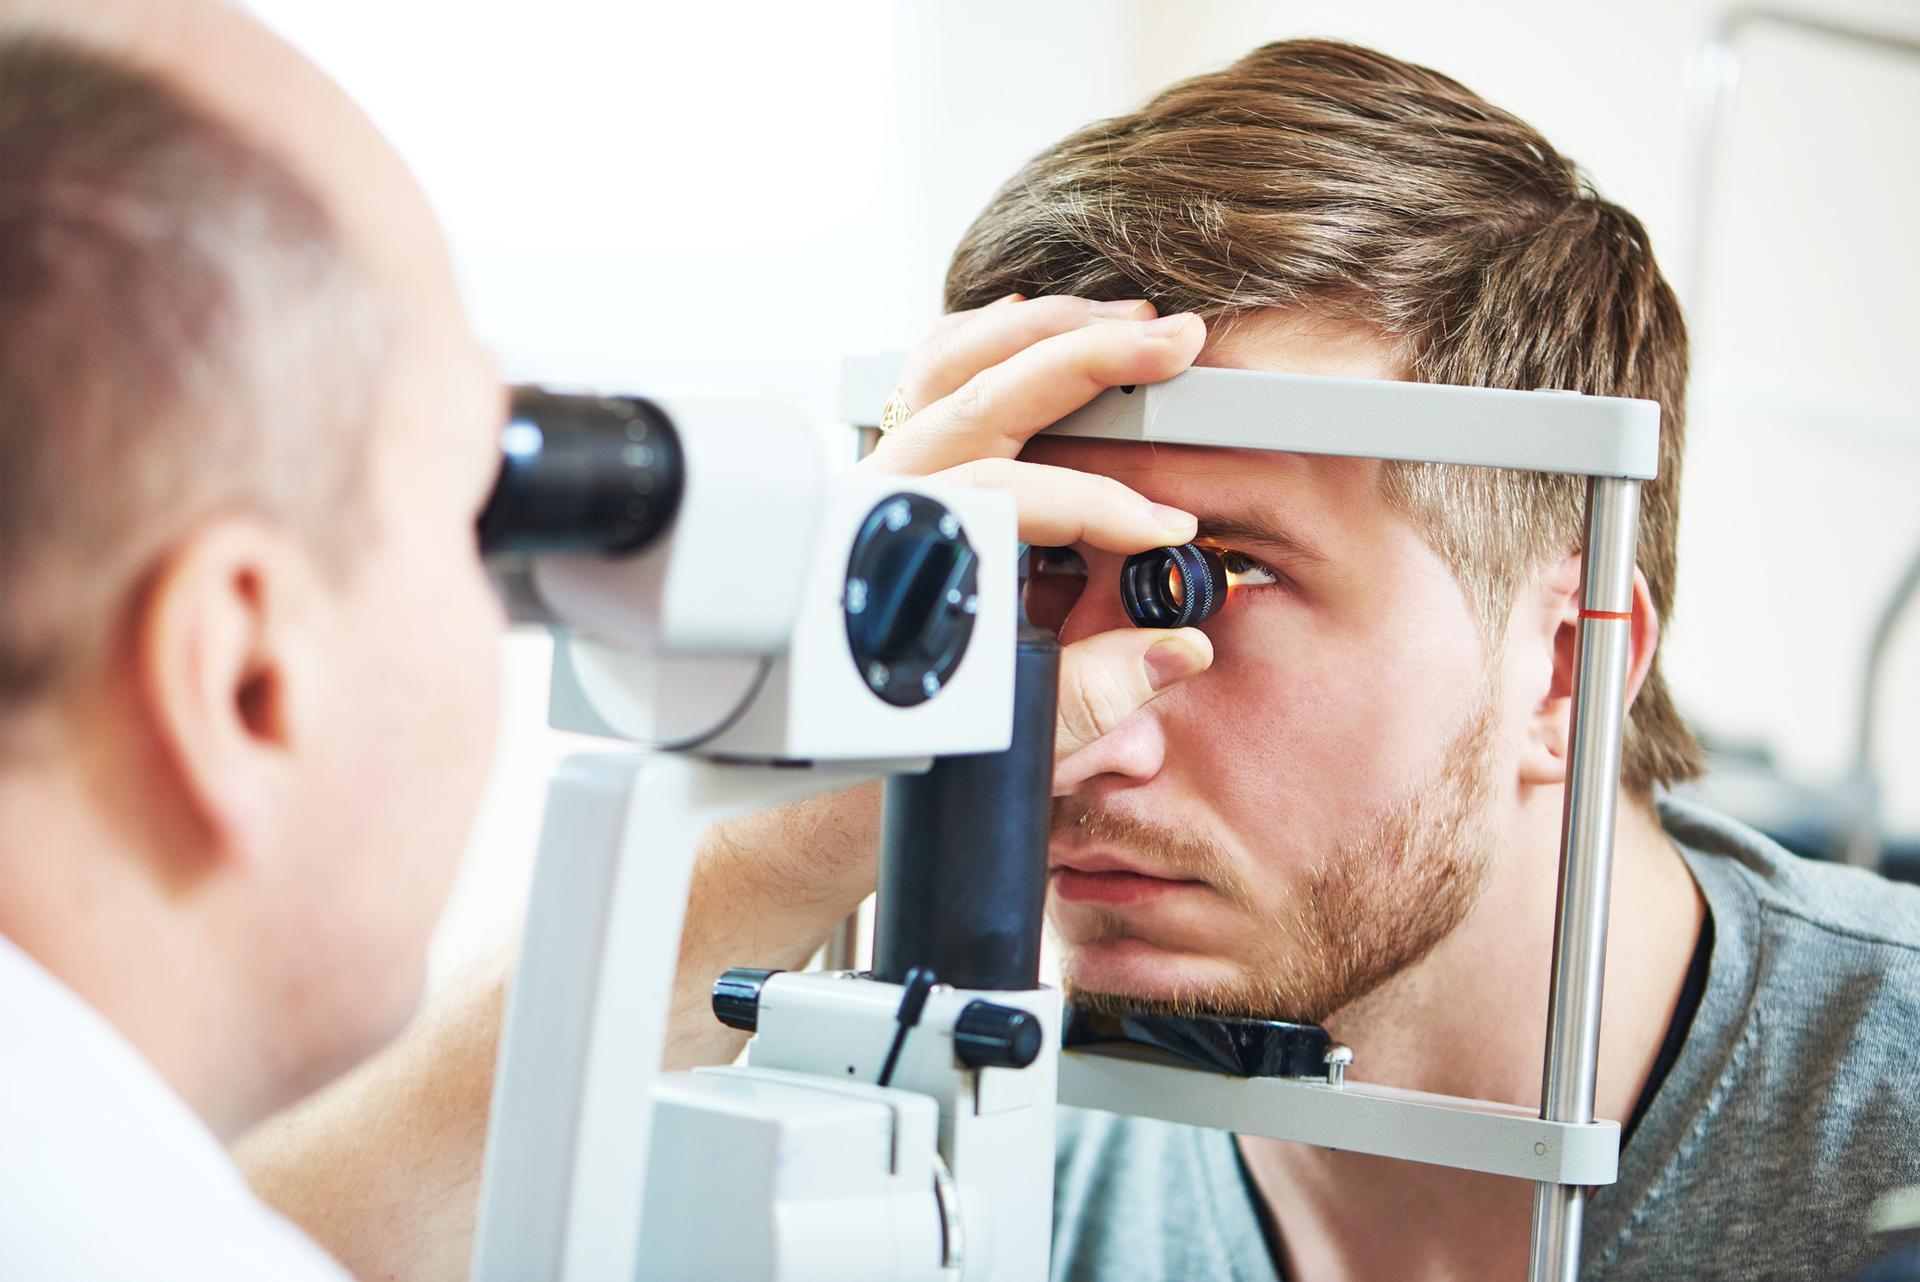 48493fb23f98 Badania wzroku. Nowoczesne metody badania wzroku